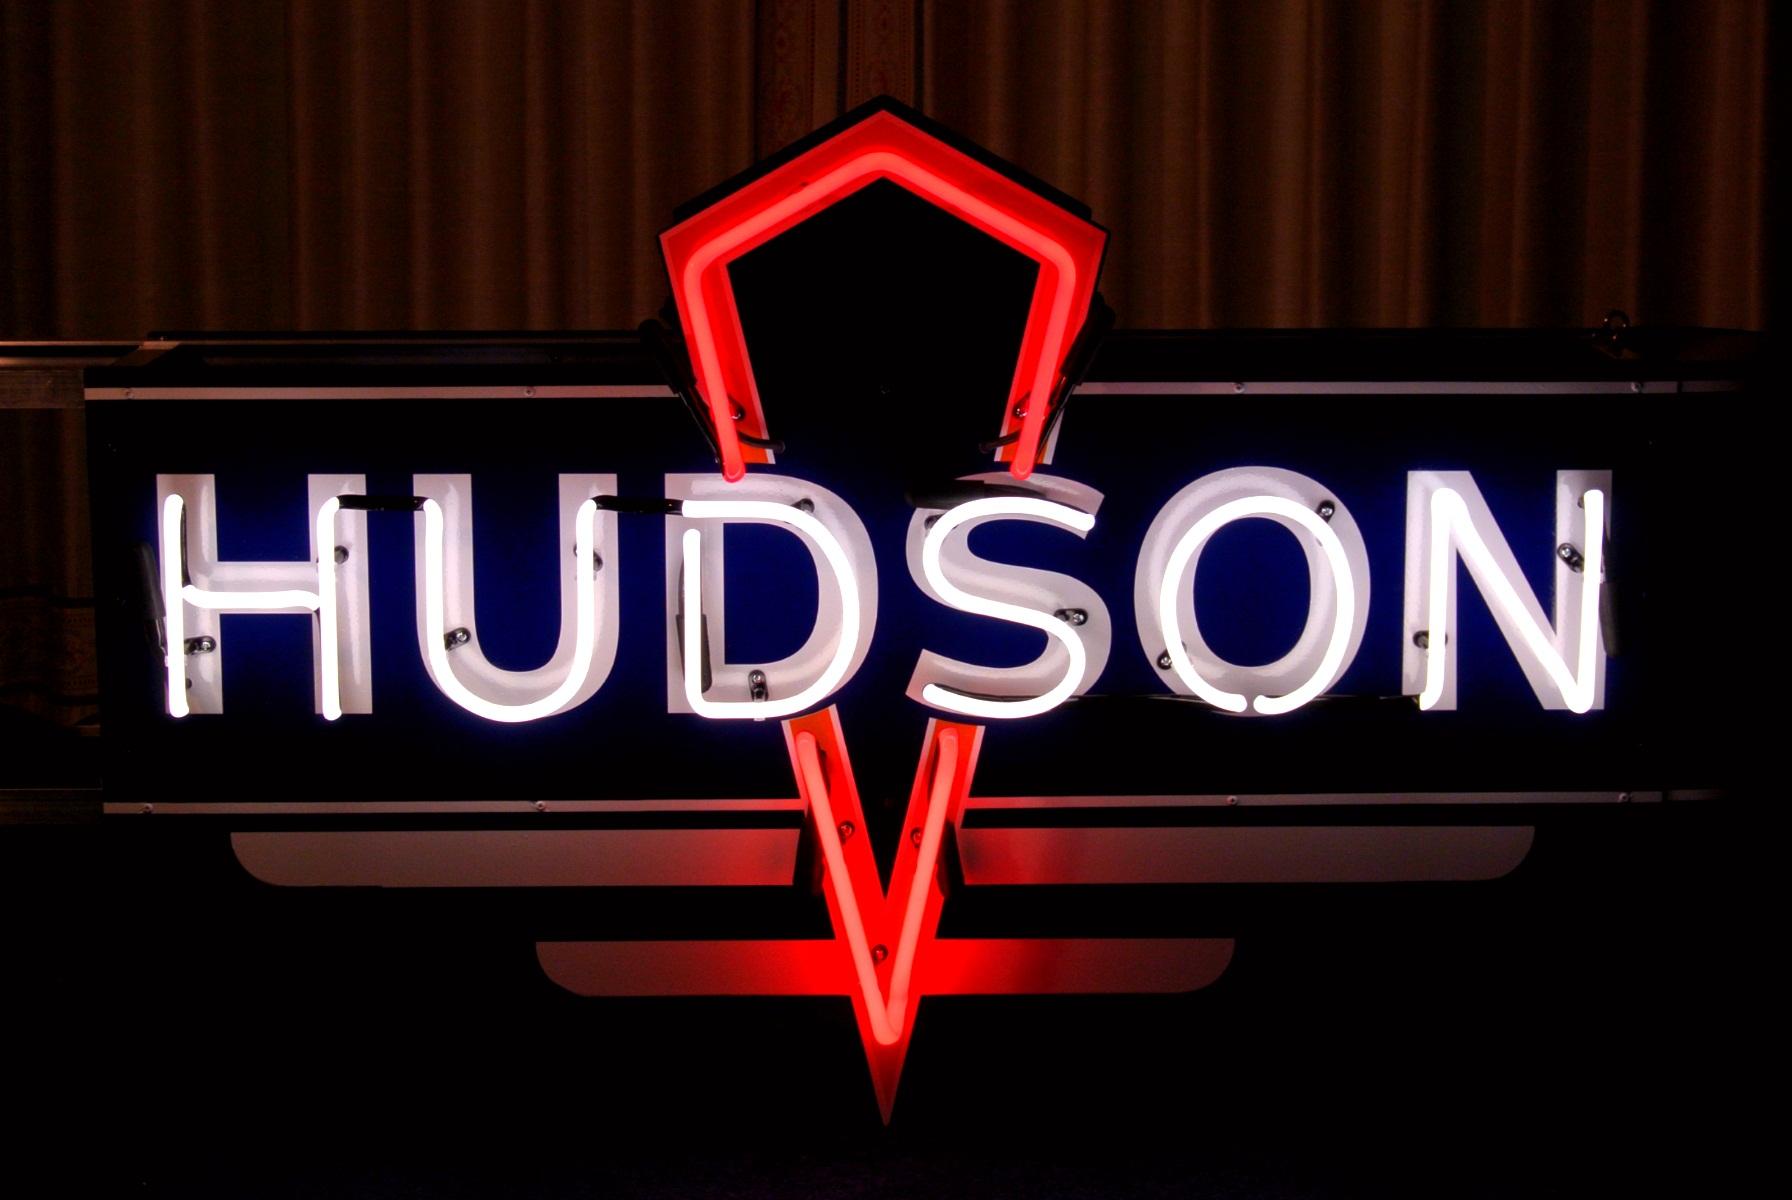 HUDSON NEON SIGNS by John Barton - Famous American Neon Glass Artist - BartonNeonMagic.com